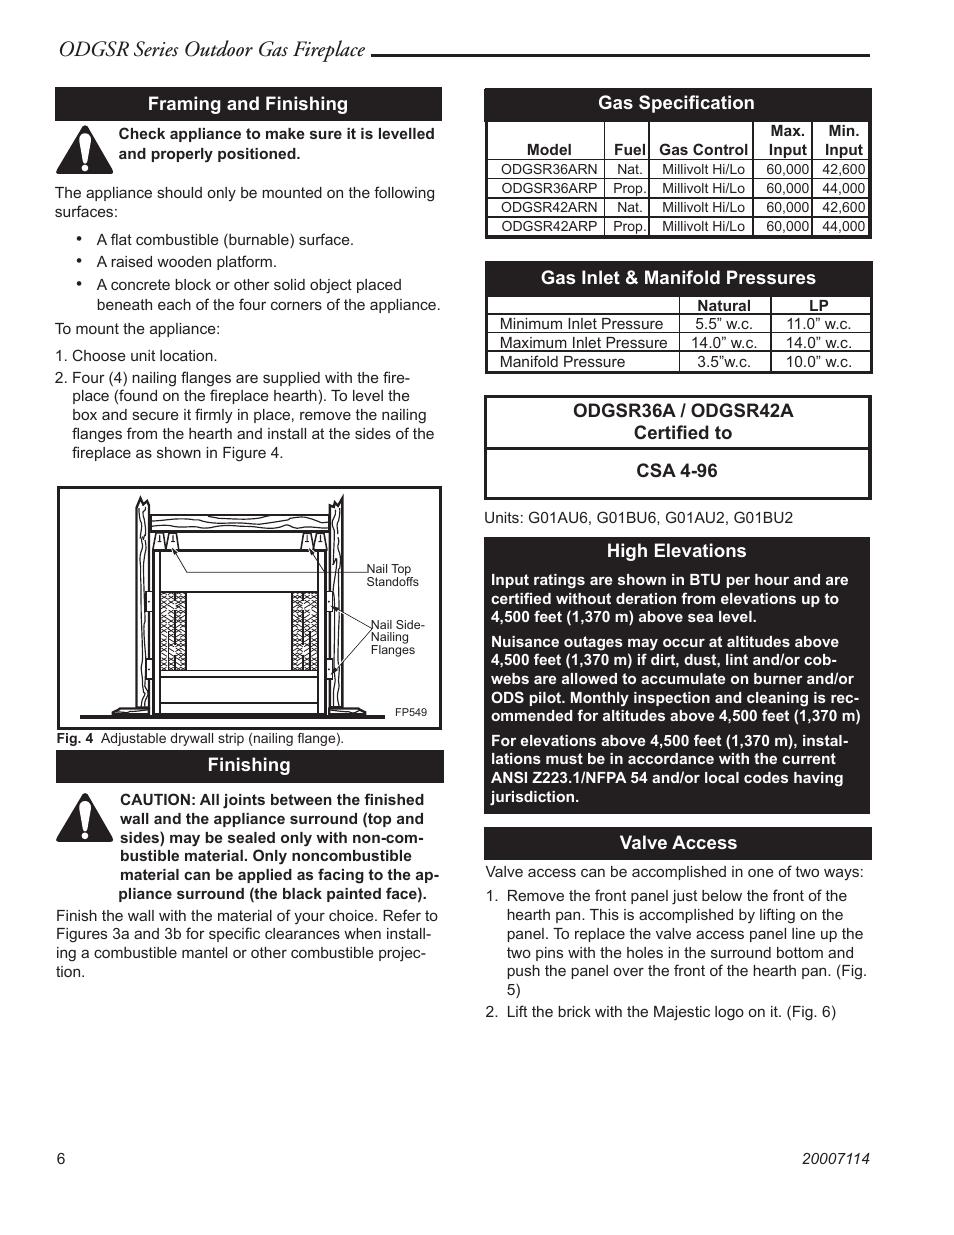 majestic appliances odgsr36a page6